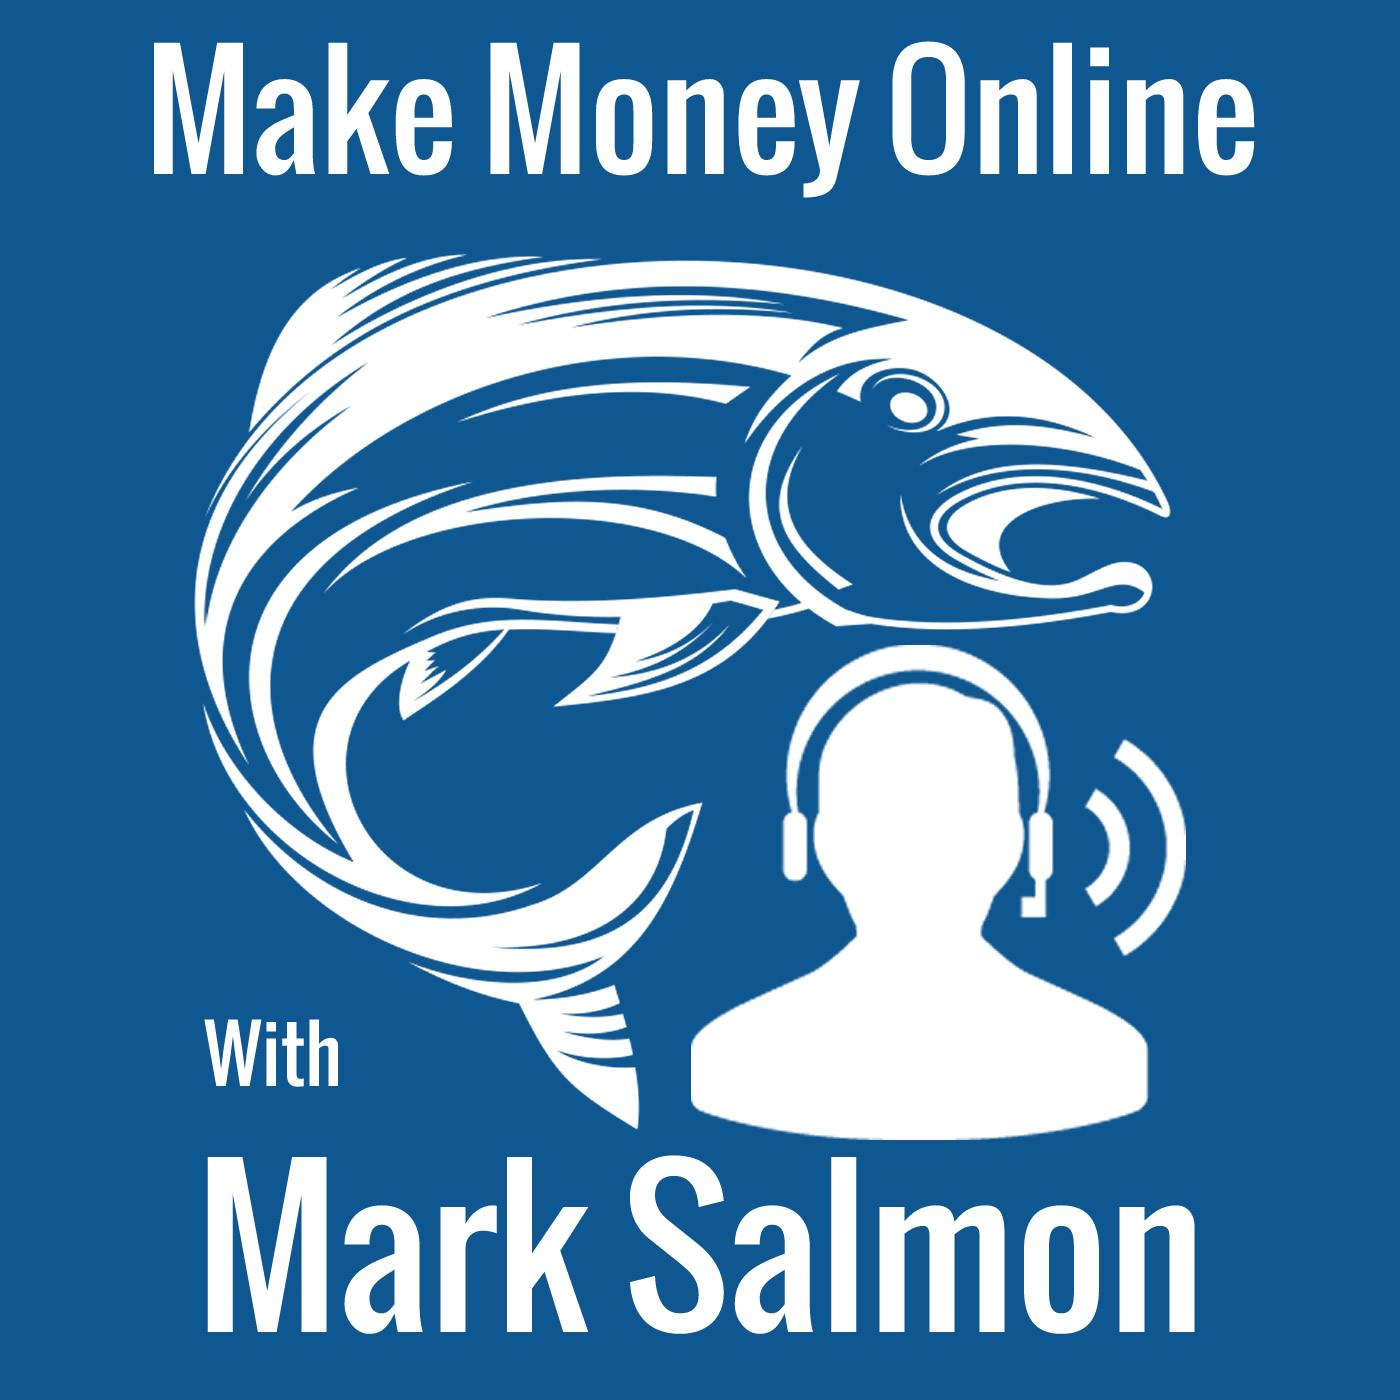 Mark-Salmon.com